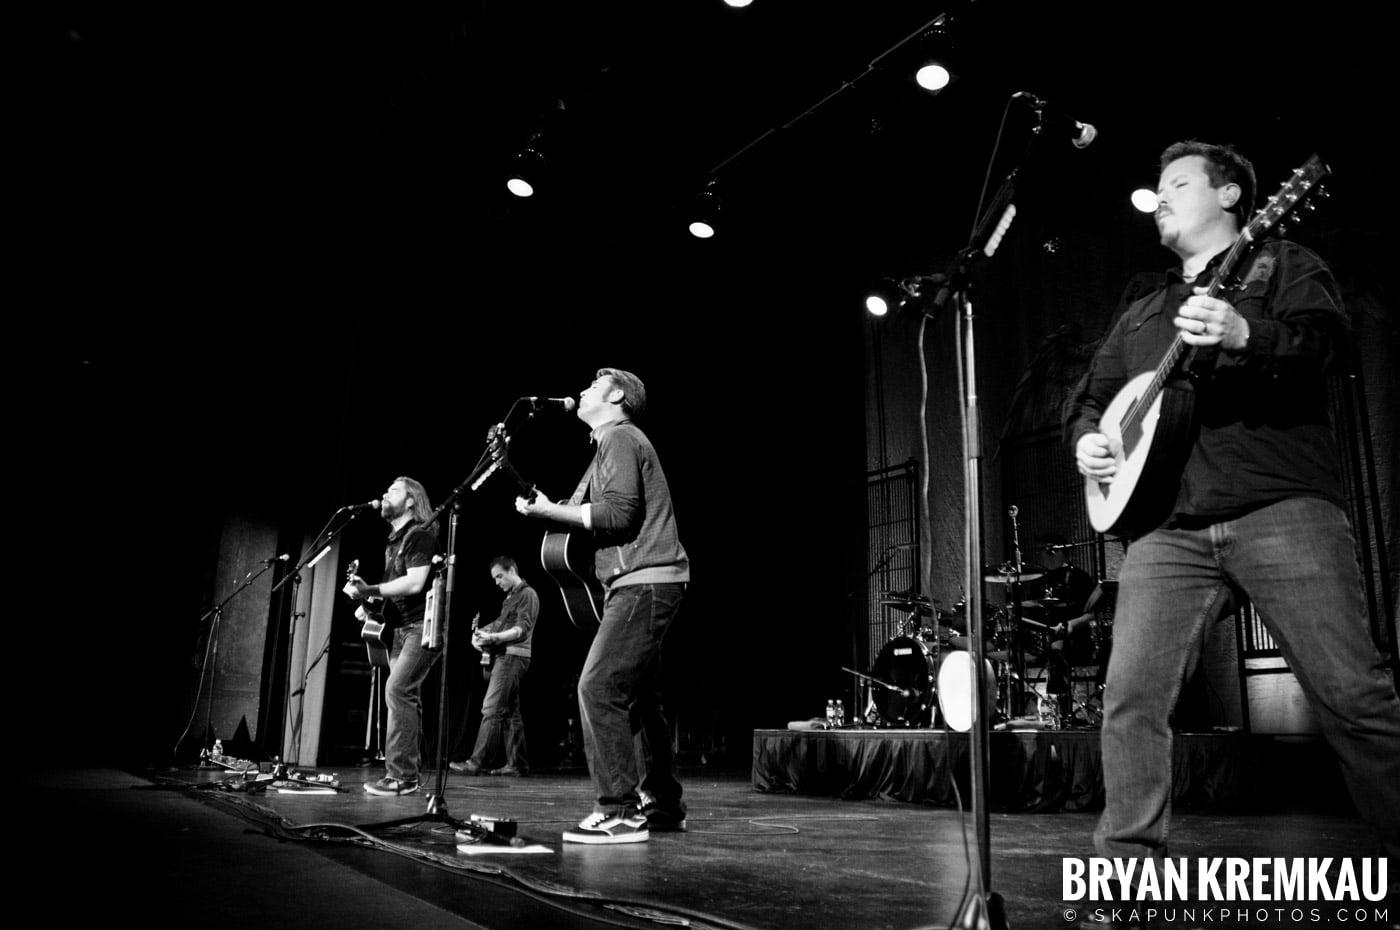 Great Big Sea @ Tarrytown Music Hall, Tarrytown, NY - 10.10.09 (4)